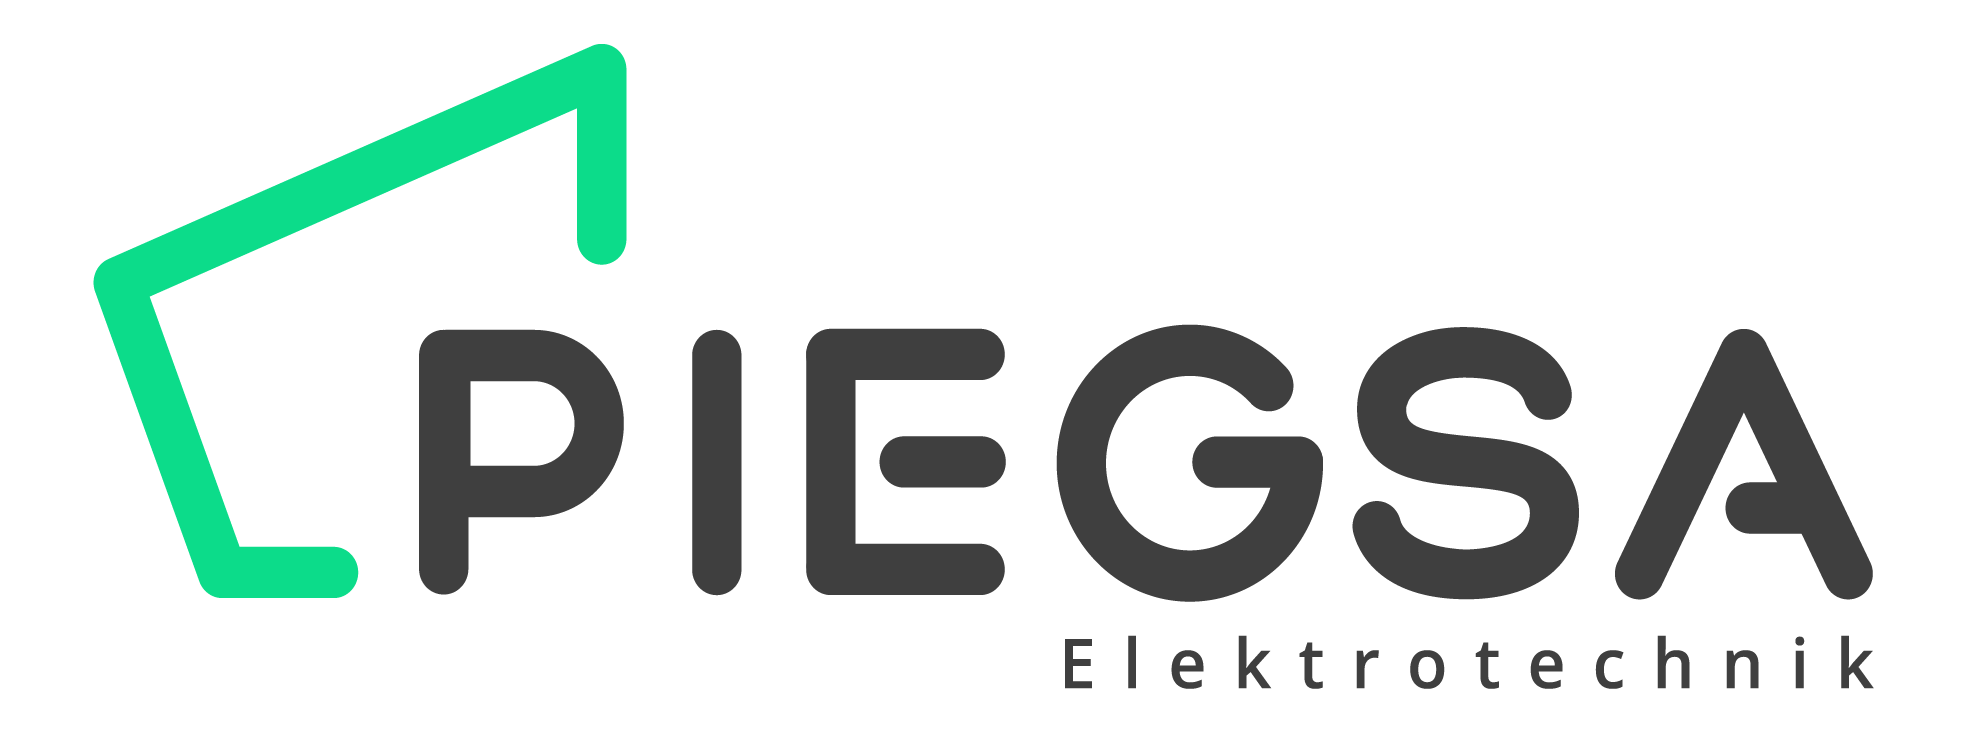 Piegsa Elektrotechnik